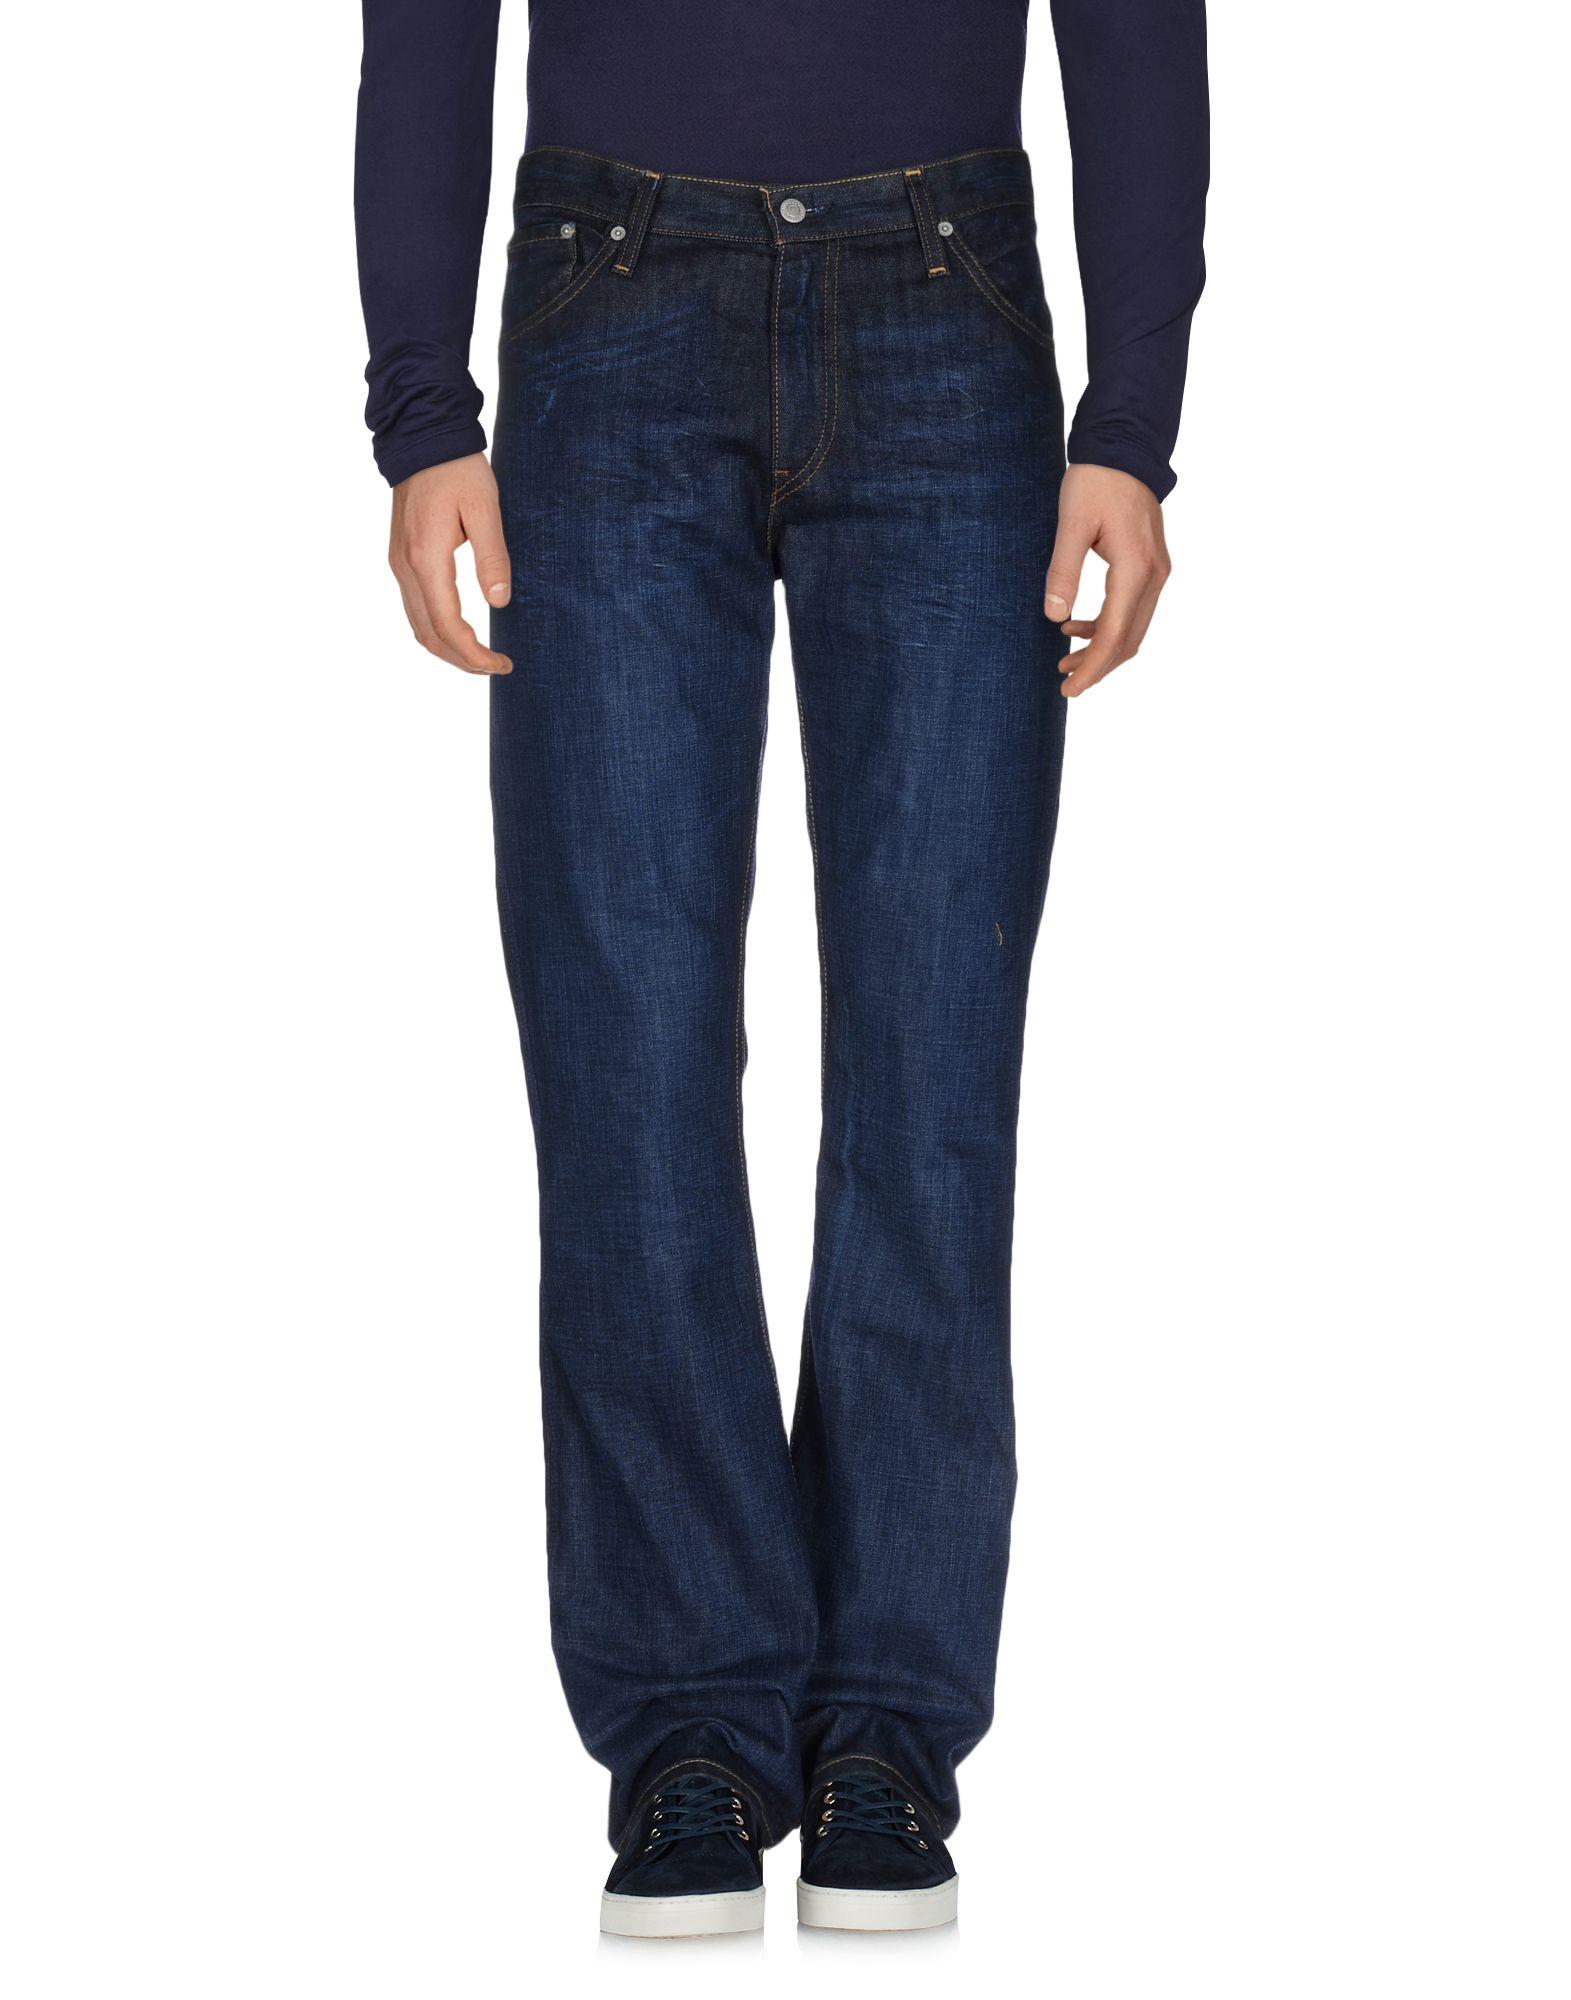 levi 39 s denim trousers in blue for men lyst. Black Bedroom Furniture Sets. Home Design Ideas